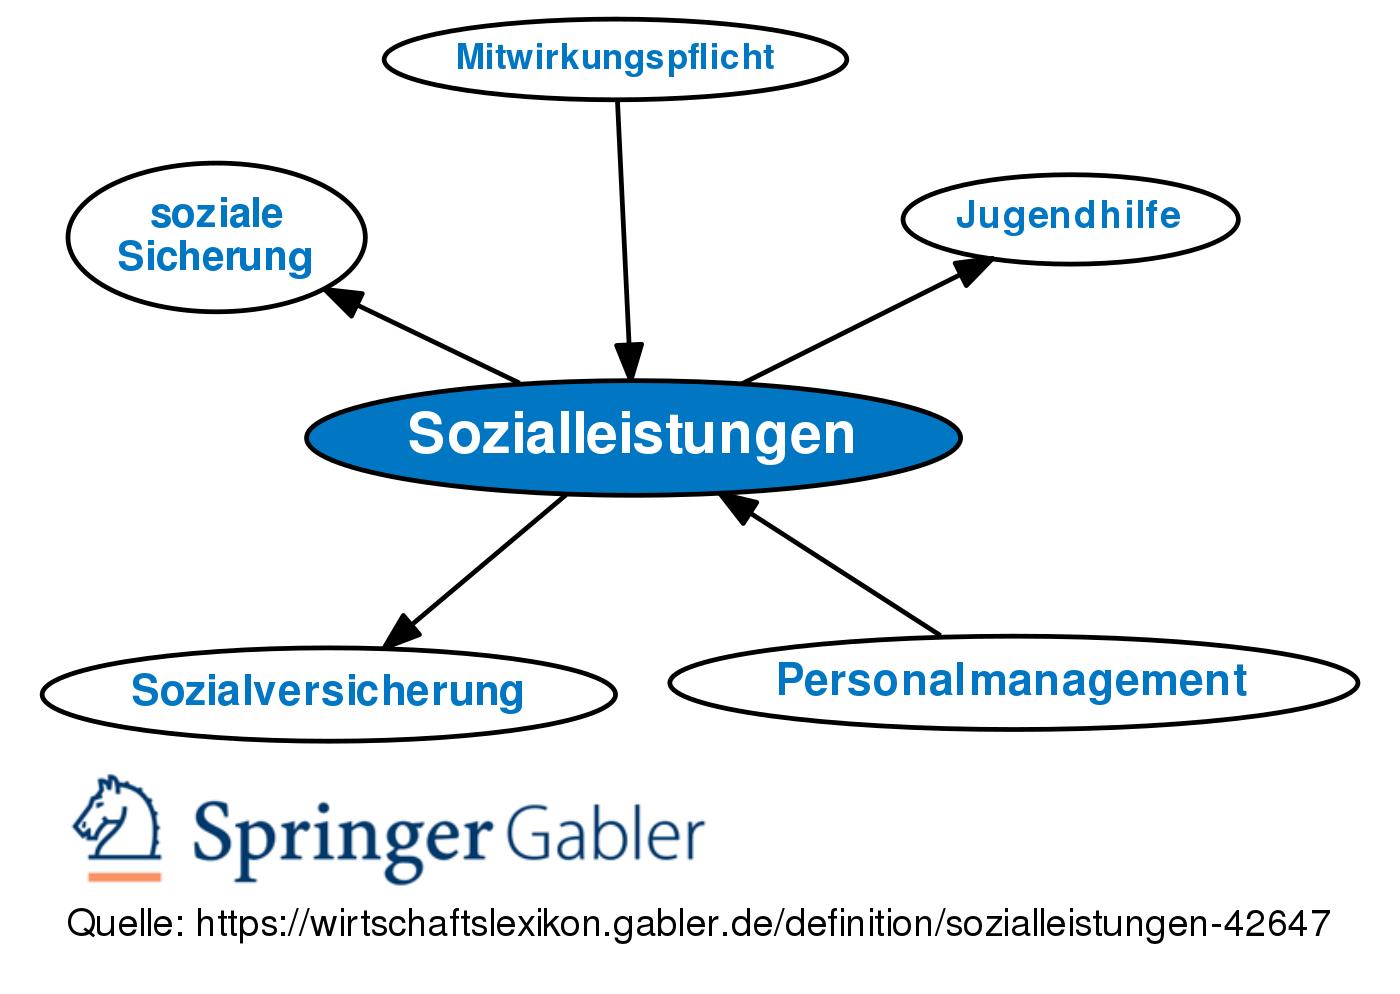 wirtschaftslexikon.gabler.de